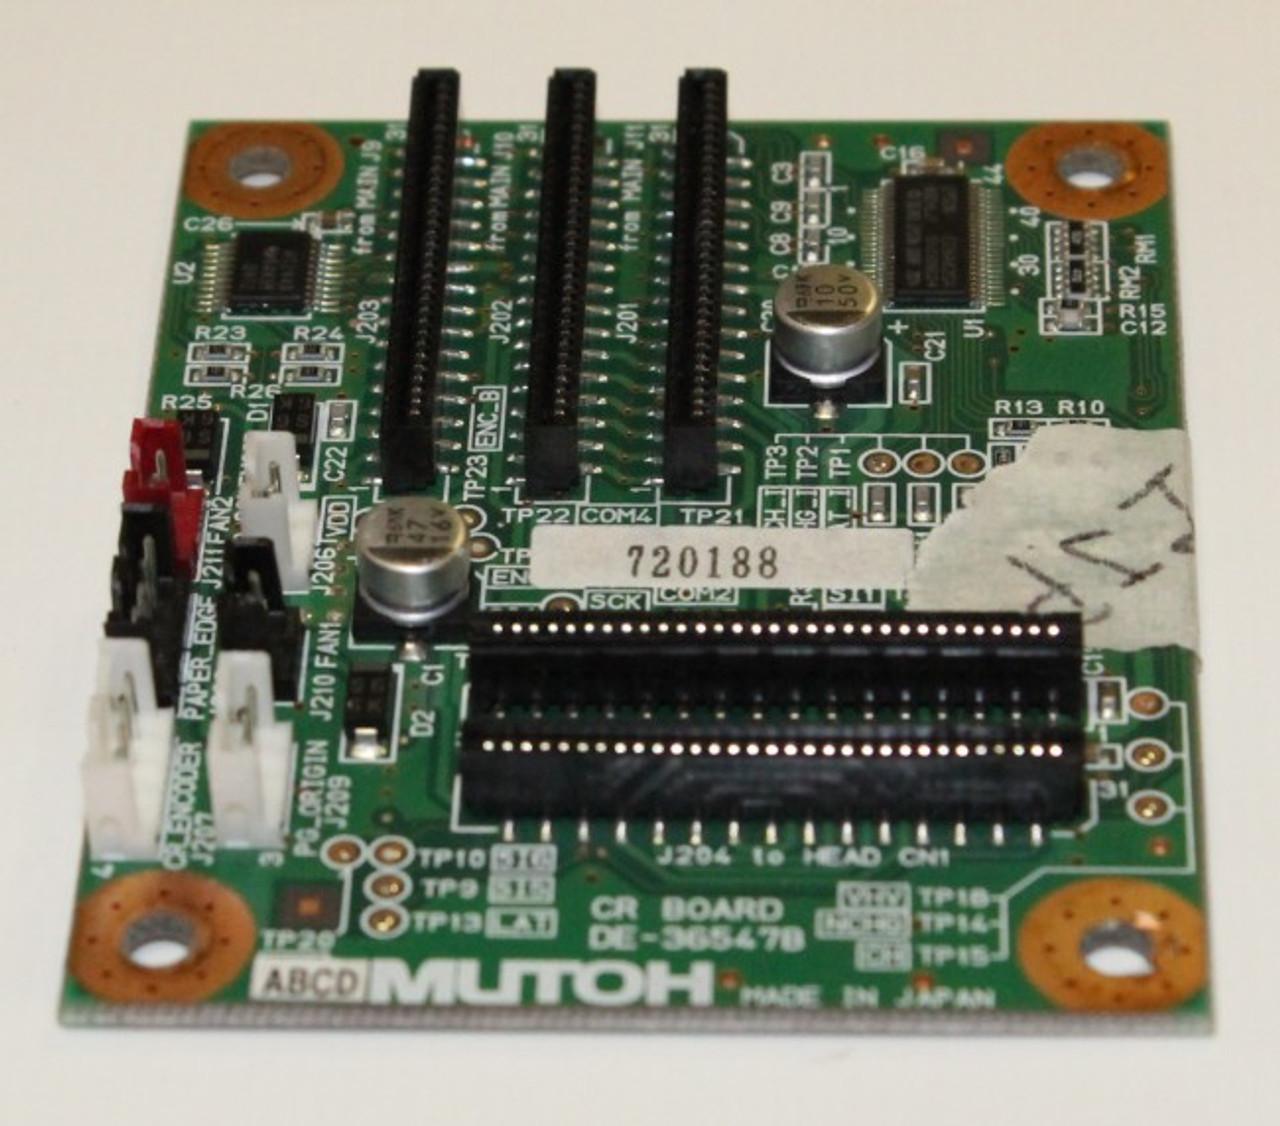 Mutoh ValueJet 1614A/1604 CR Board